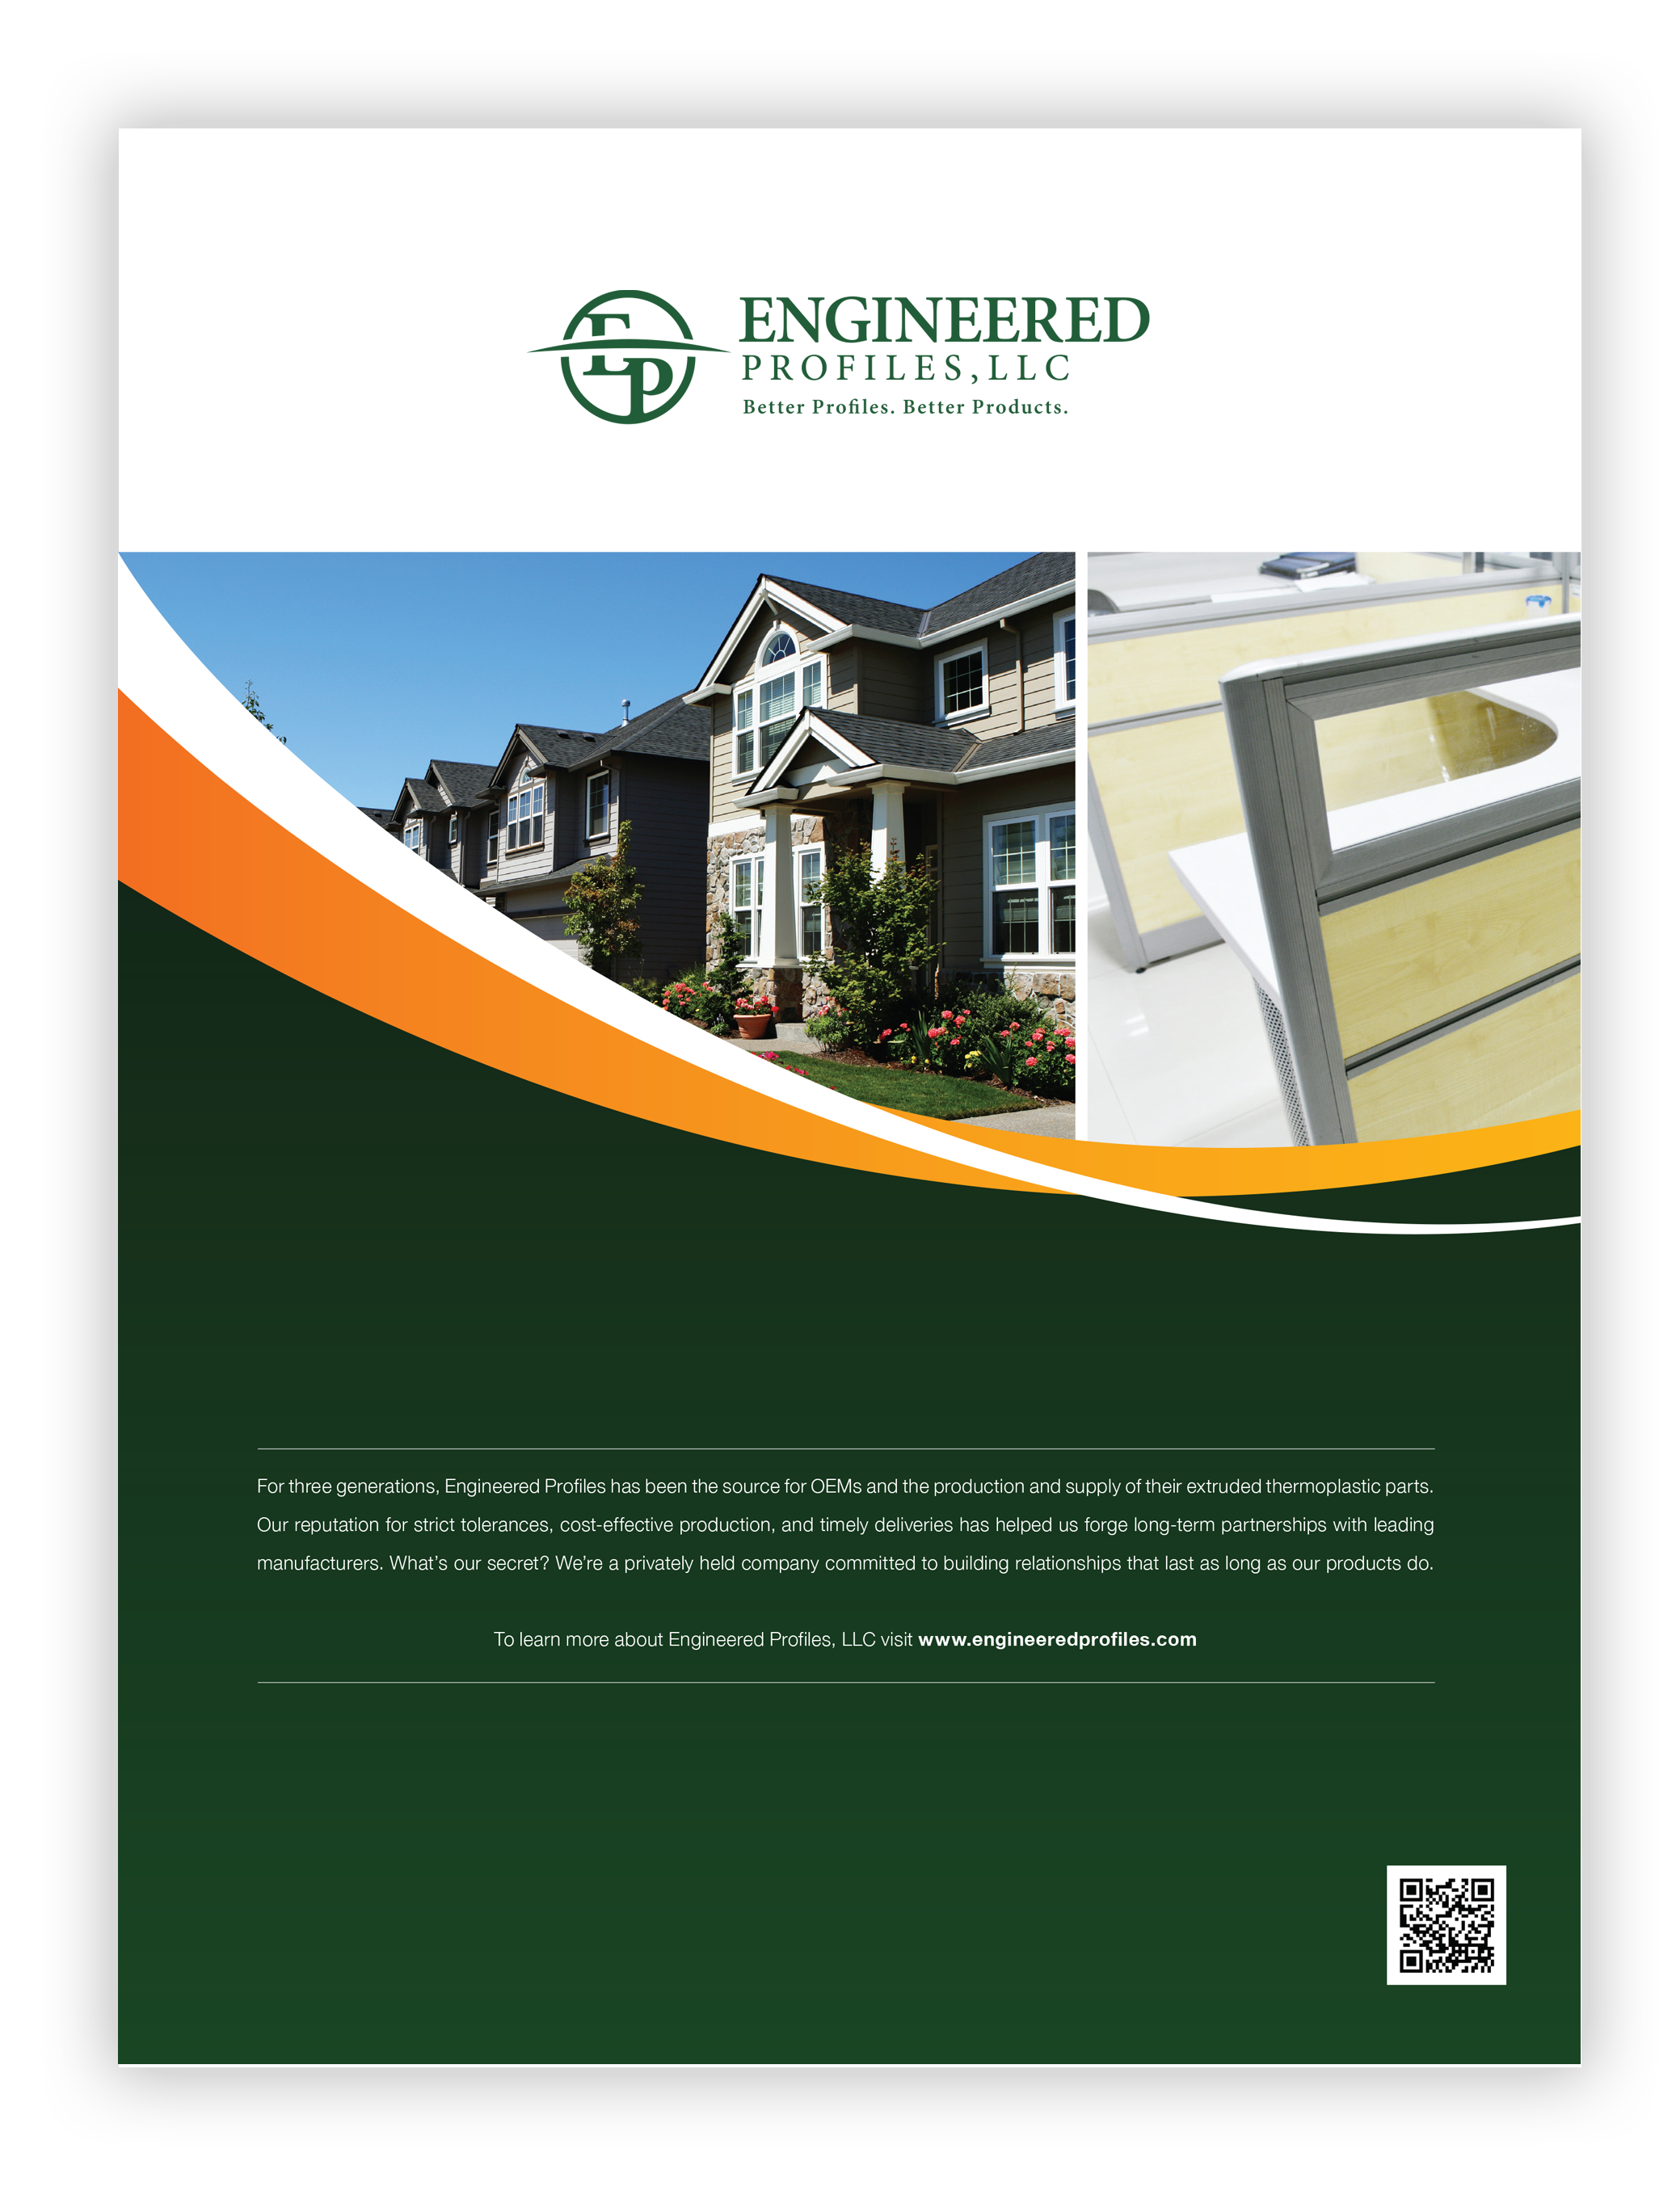 Engineered-Profiles_Brochure_Sep_2014-1